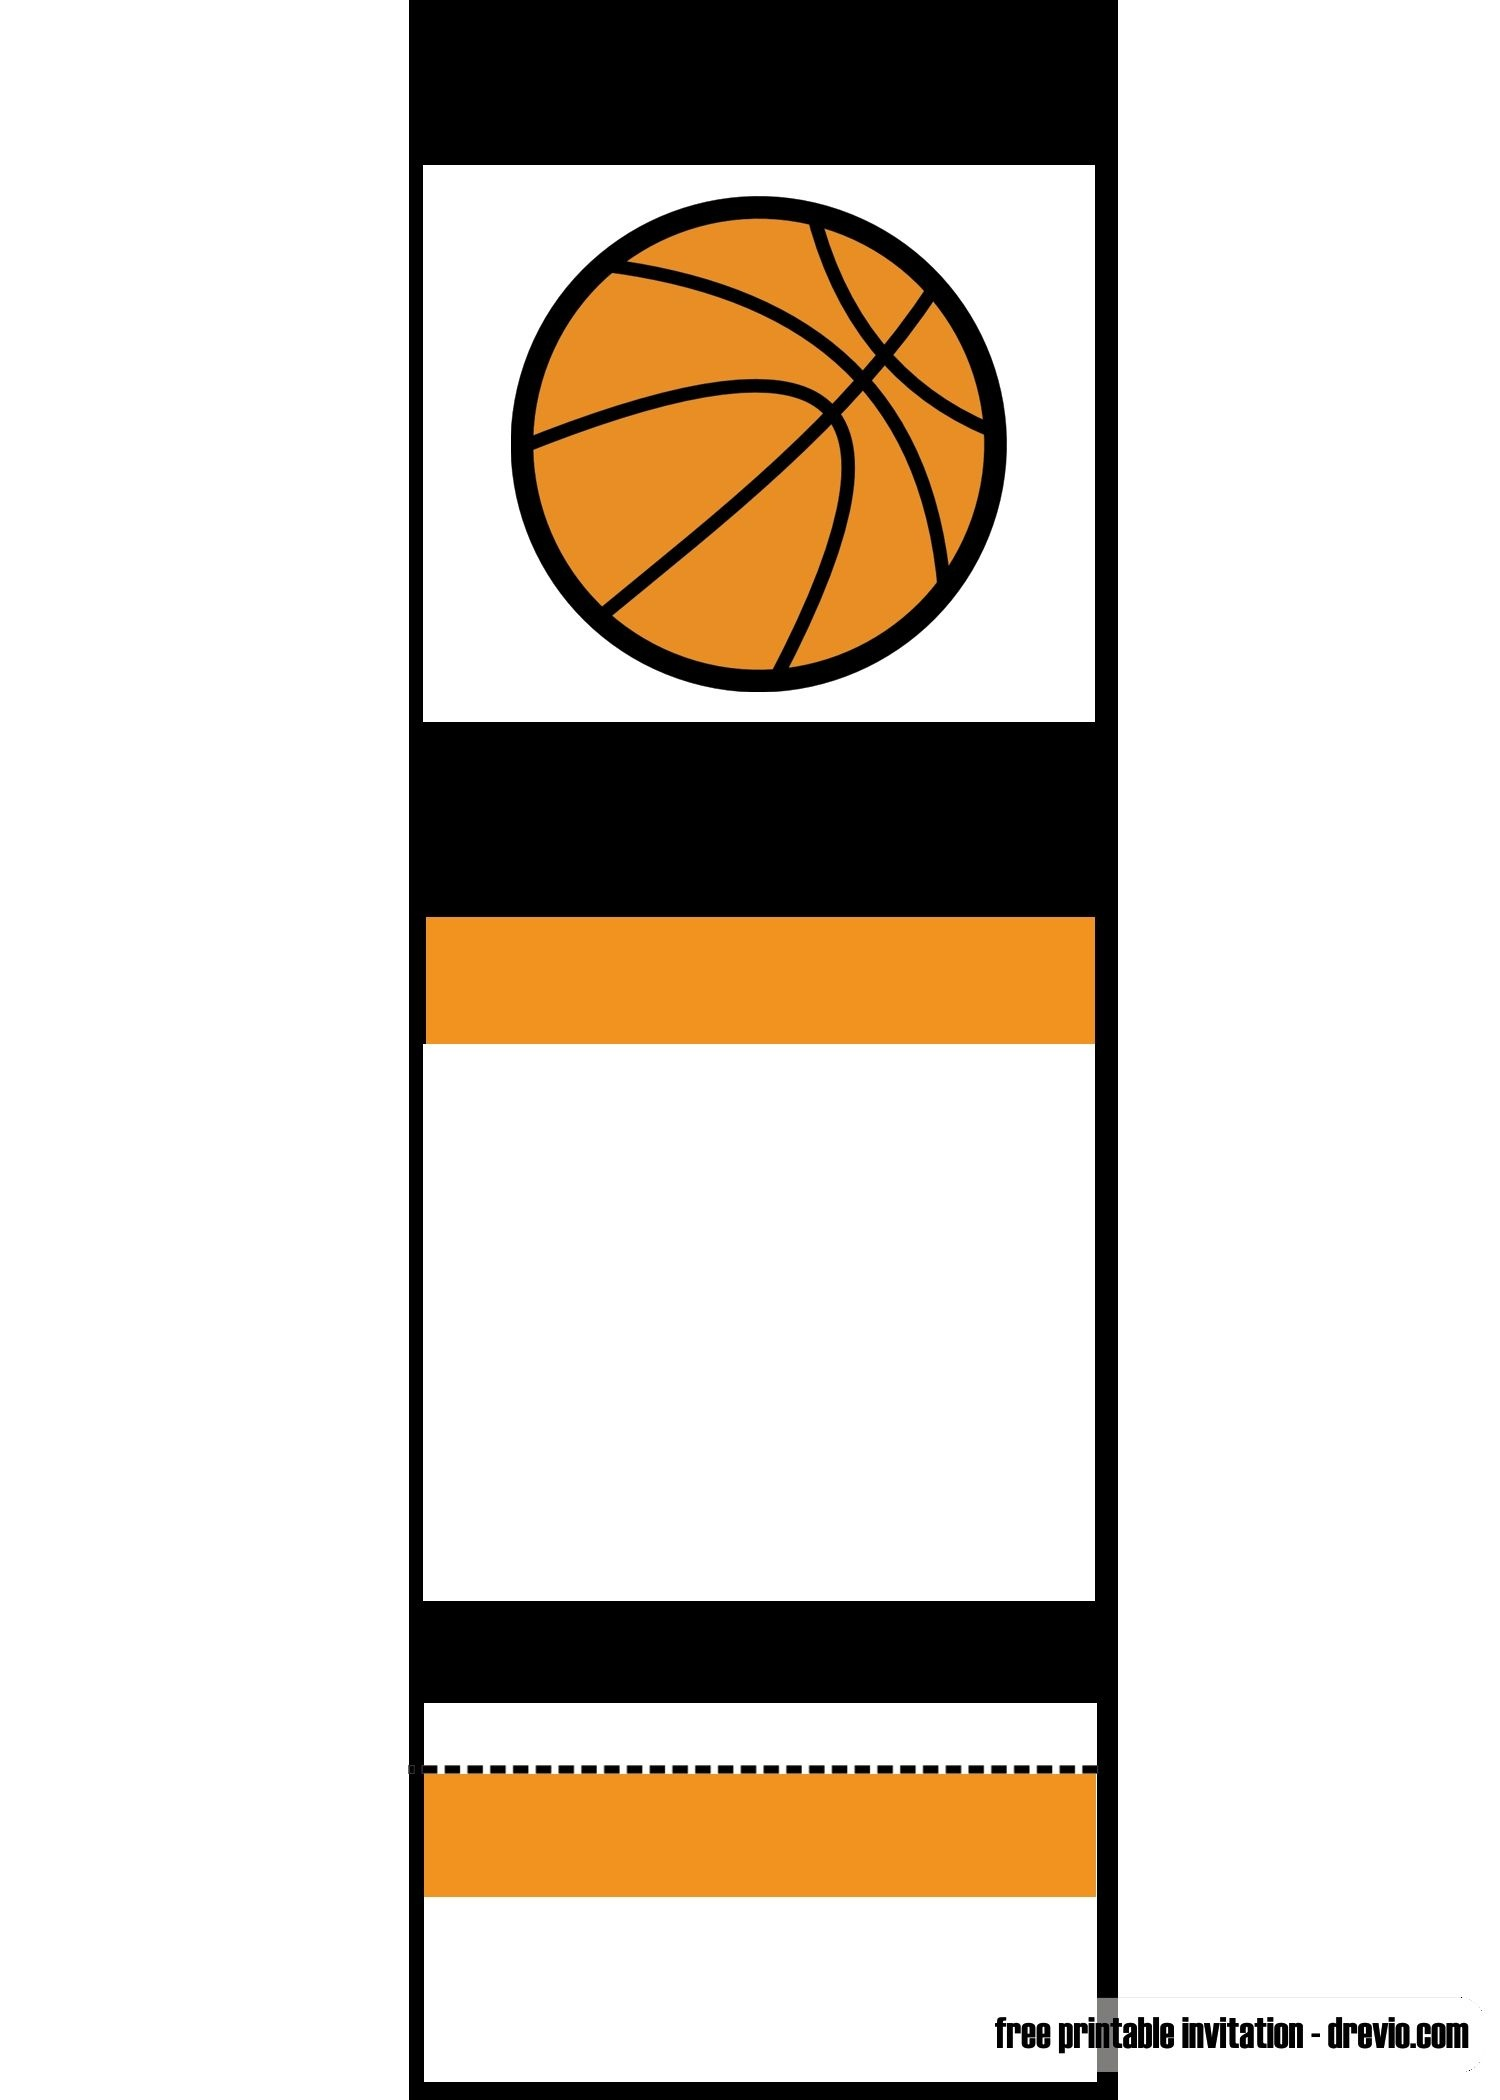 Free Printable Basketball Ticket Invitation   Unc Vs Gonzaga - Free Printable Ticket Invitations